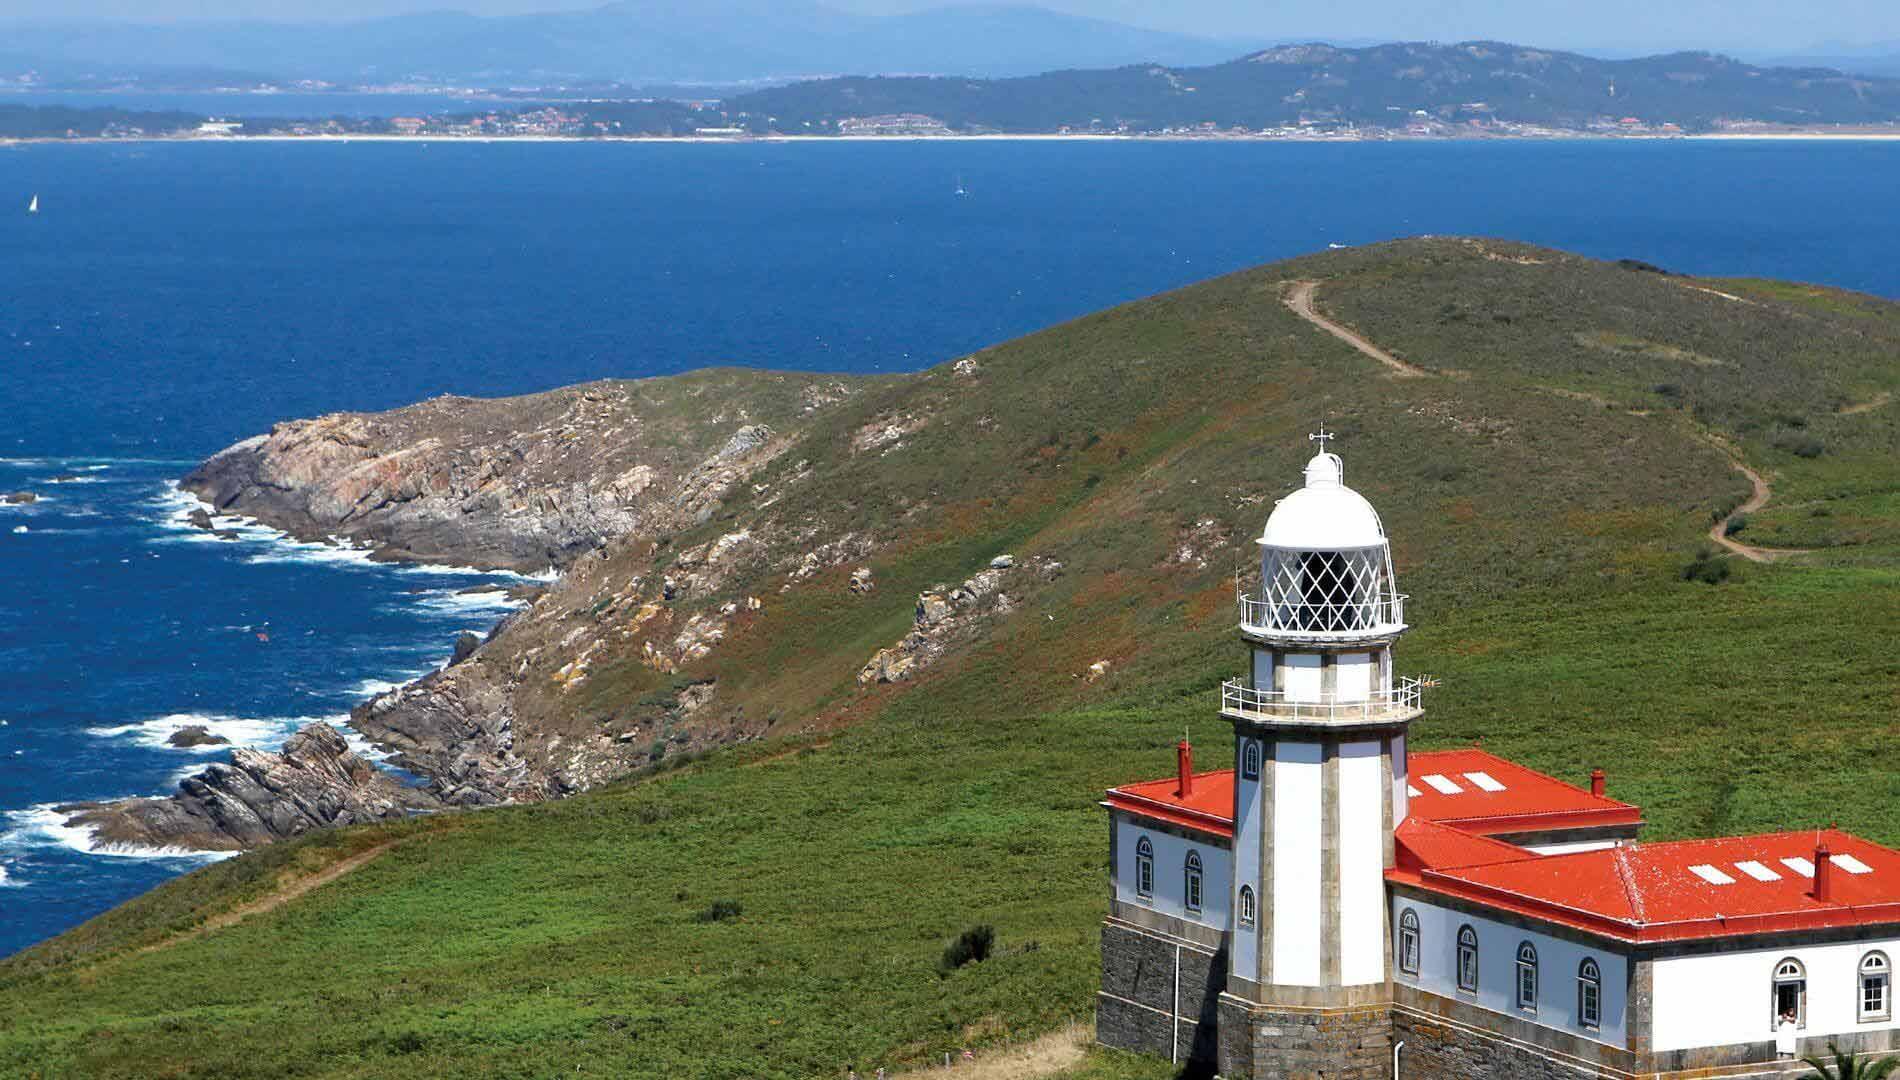 Isla De Ons Mapa.Mar De Ons Visit Cies Islands San Simon Cangas